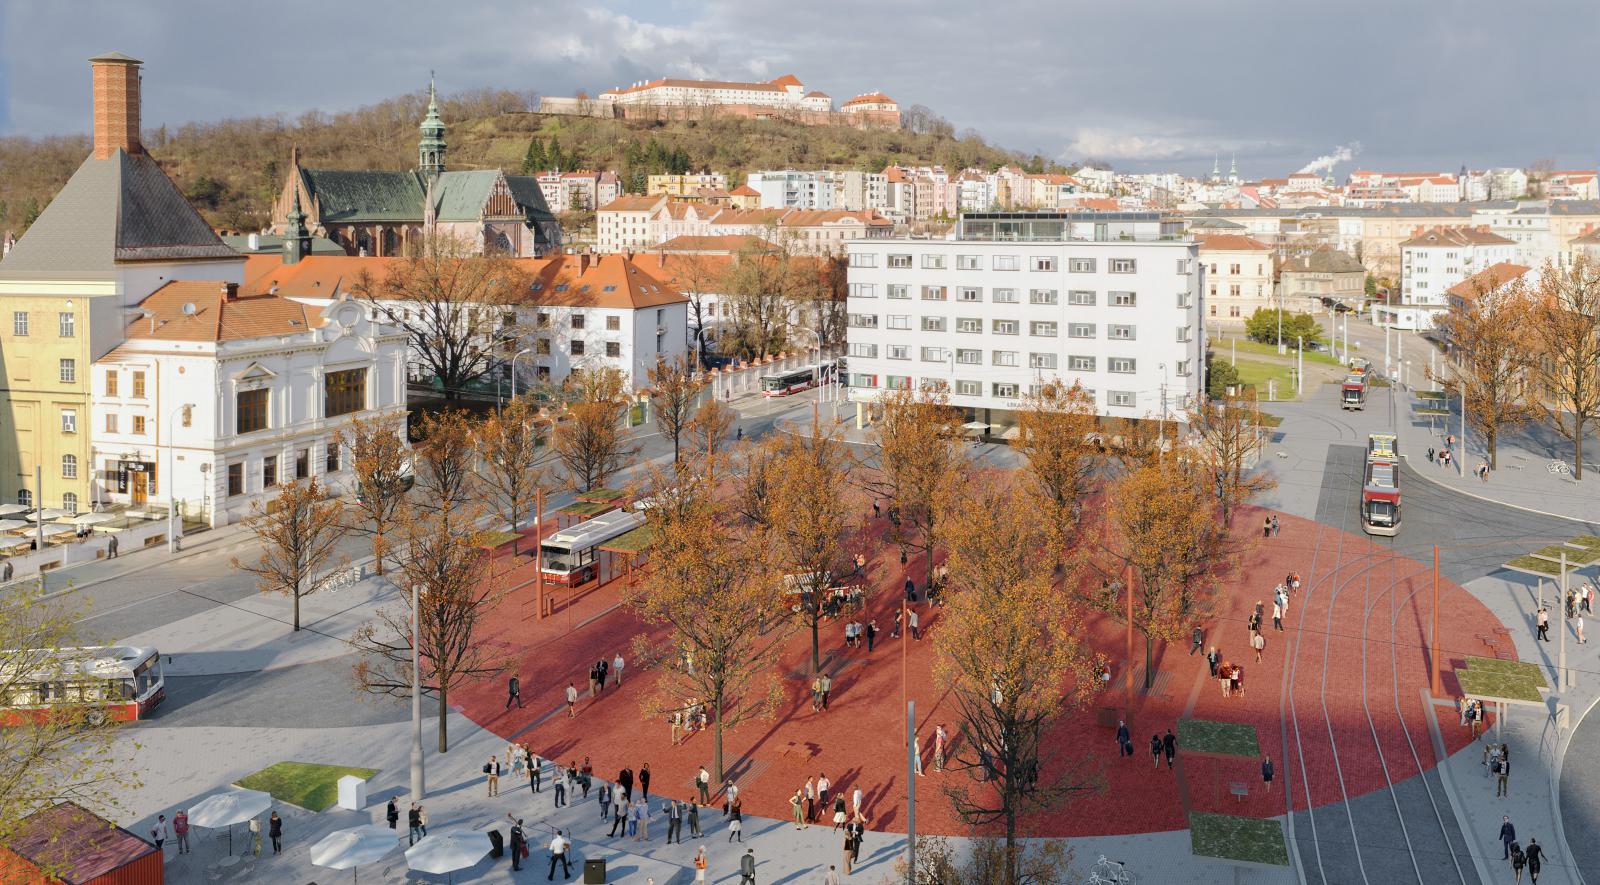 Mendel Square